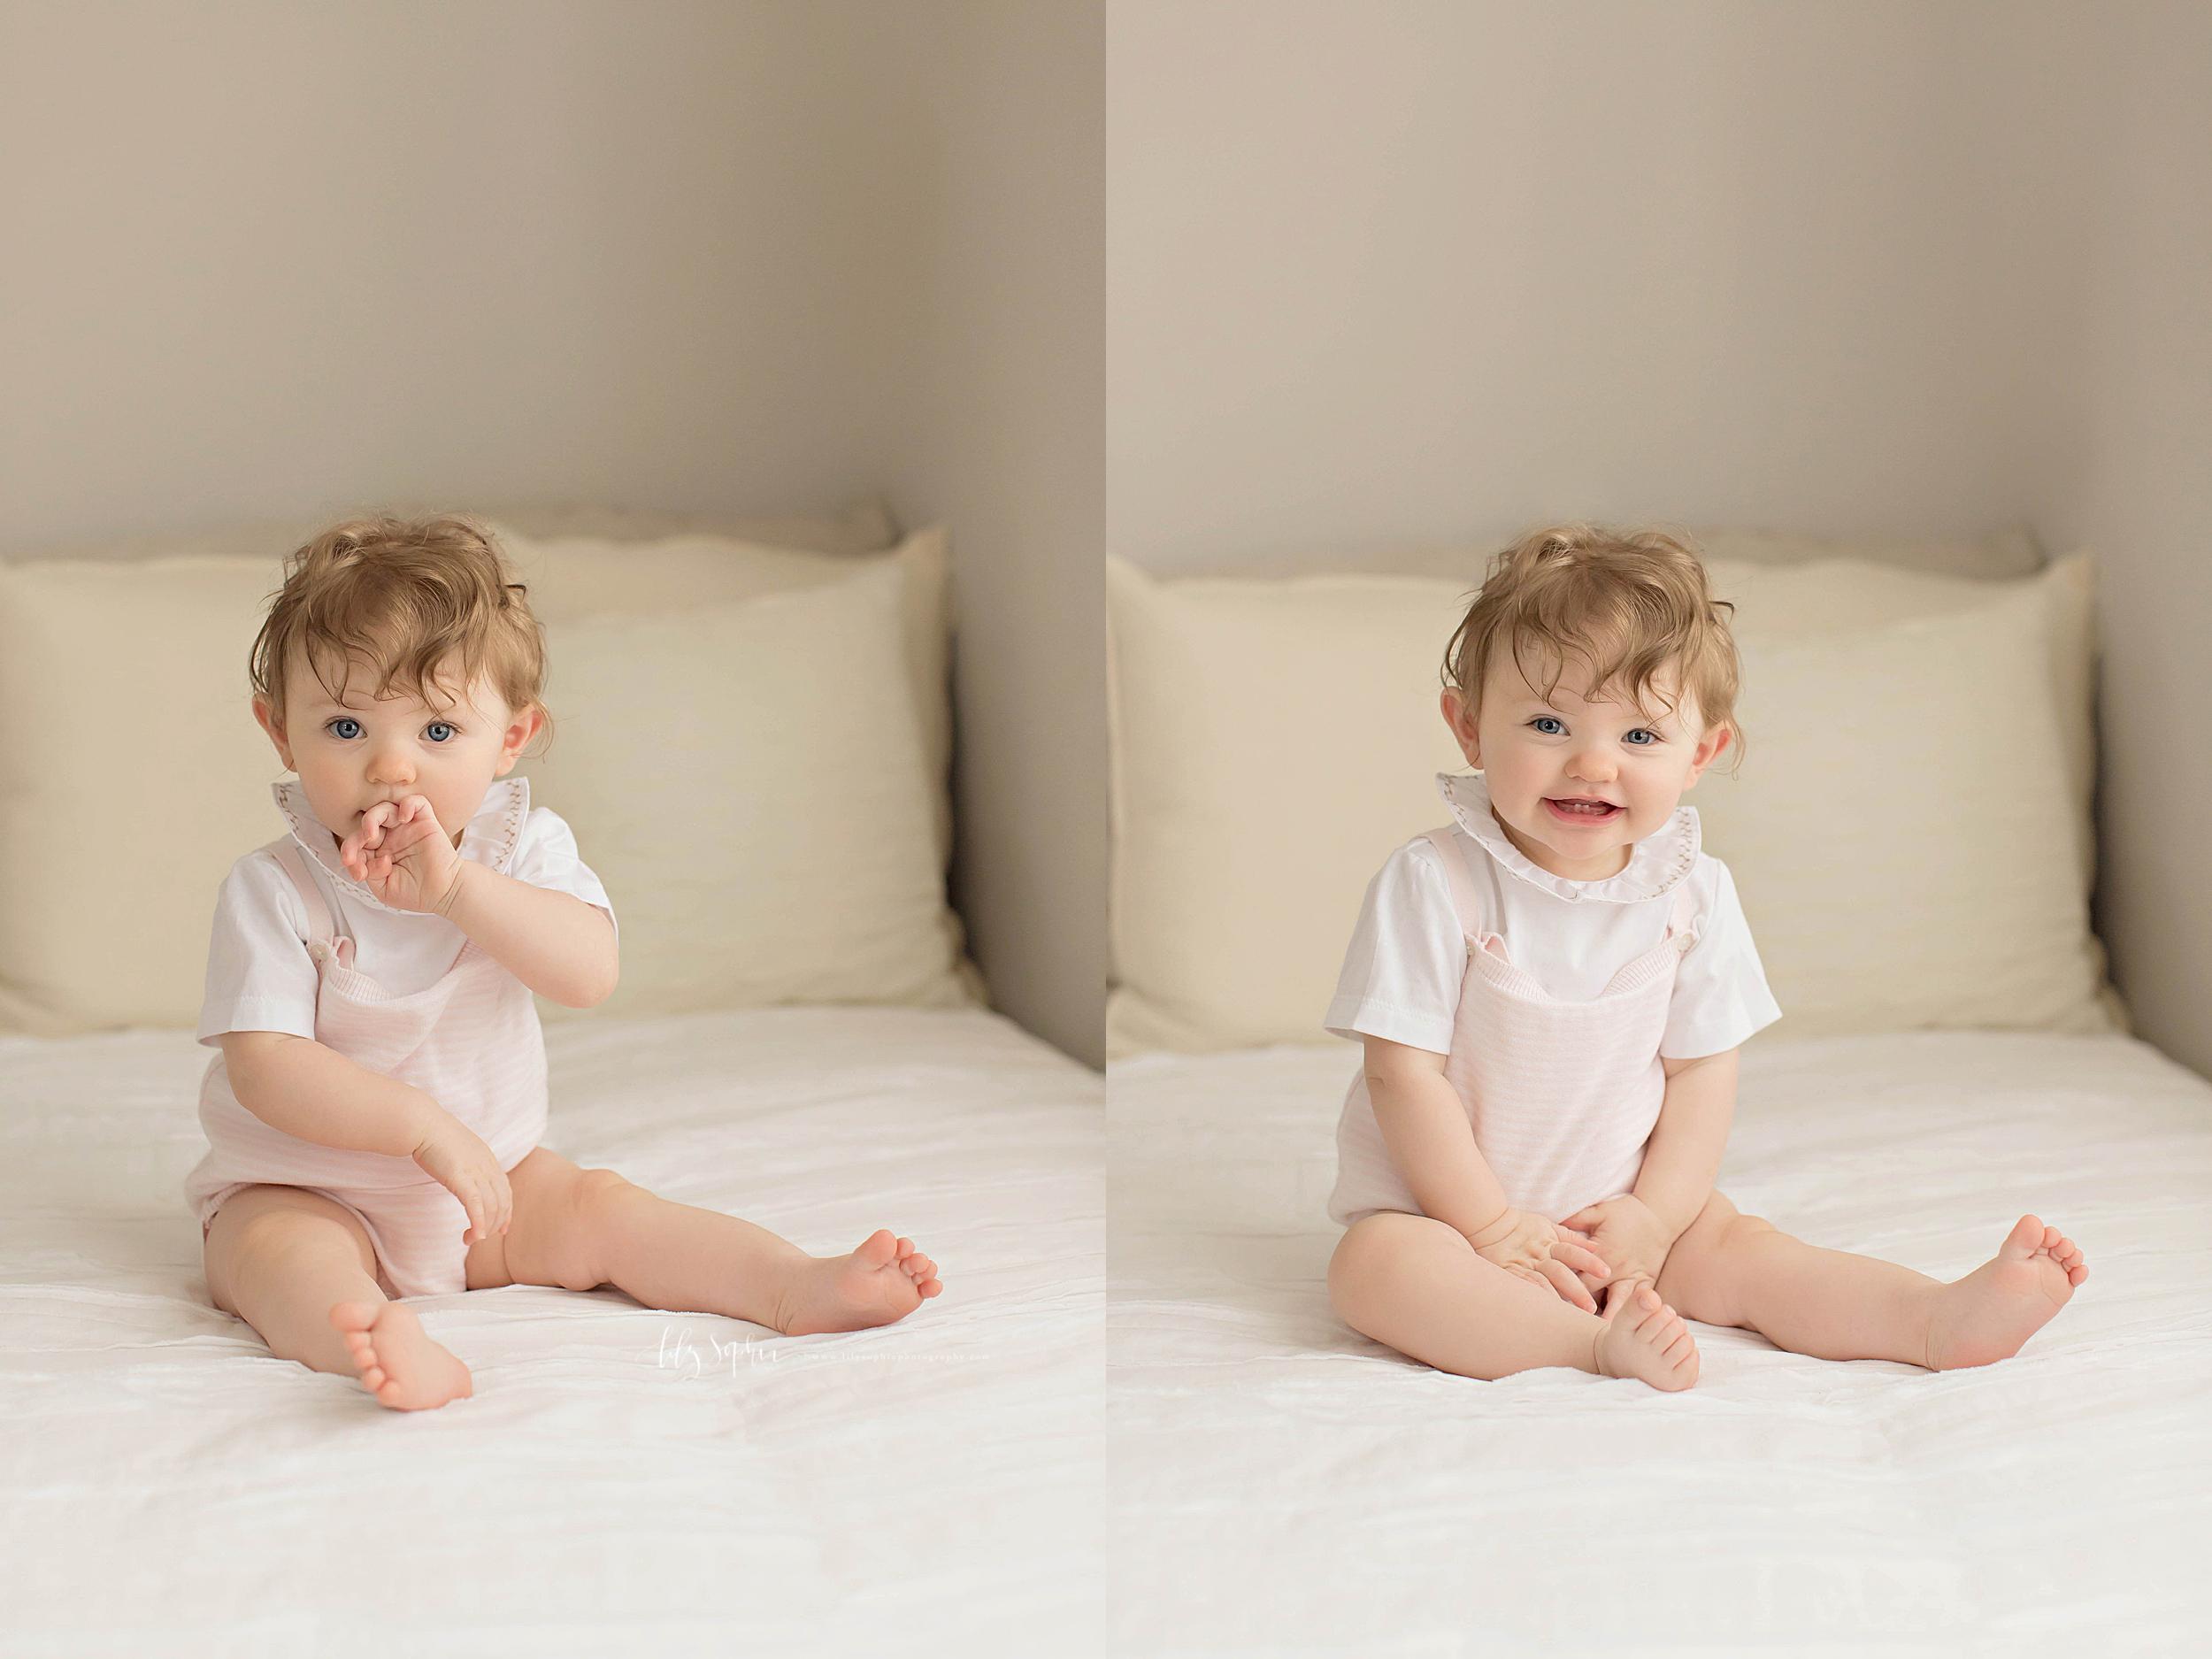 atlanta-midtown-brookhaven-decatur-lily-sophia-photography-photographer-portraits-buford-savannah-baby-girl-nine-months-family-milestone-photos_0172.jpg